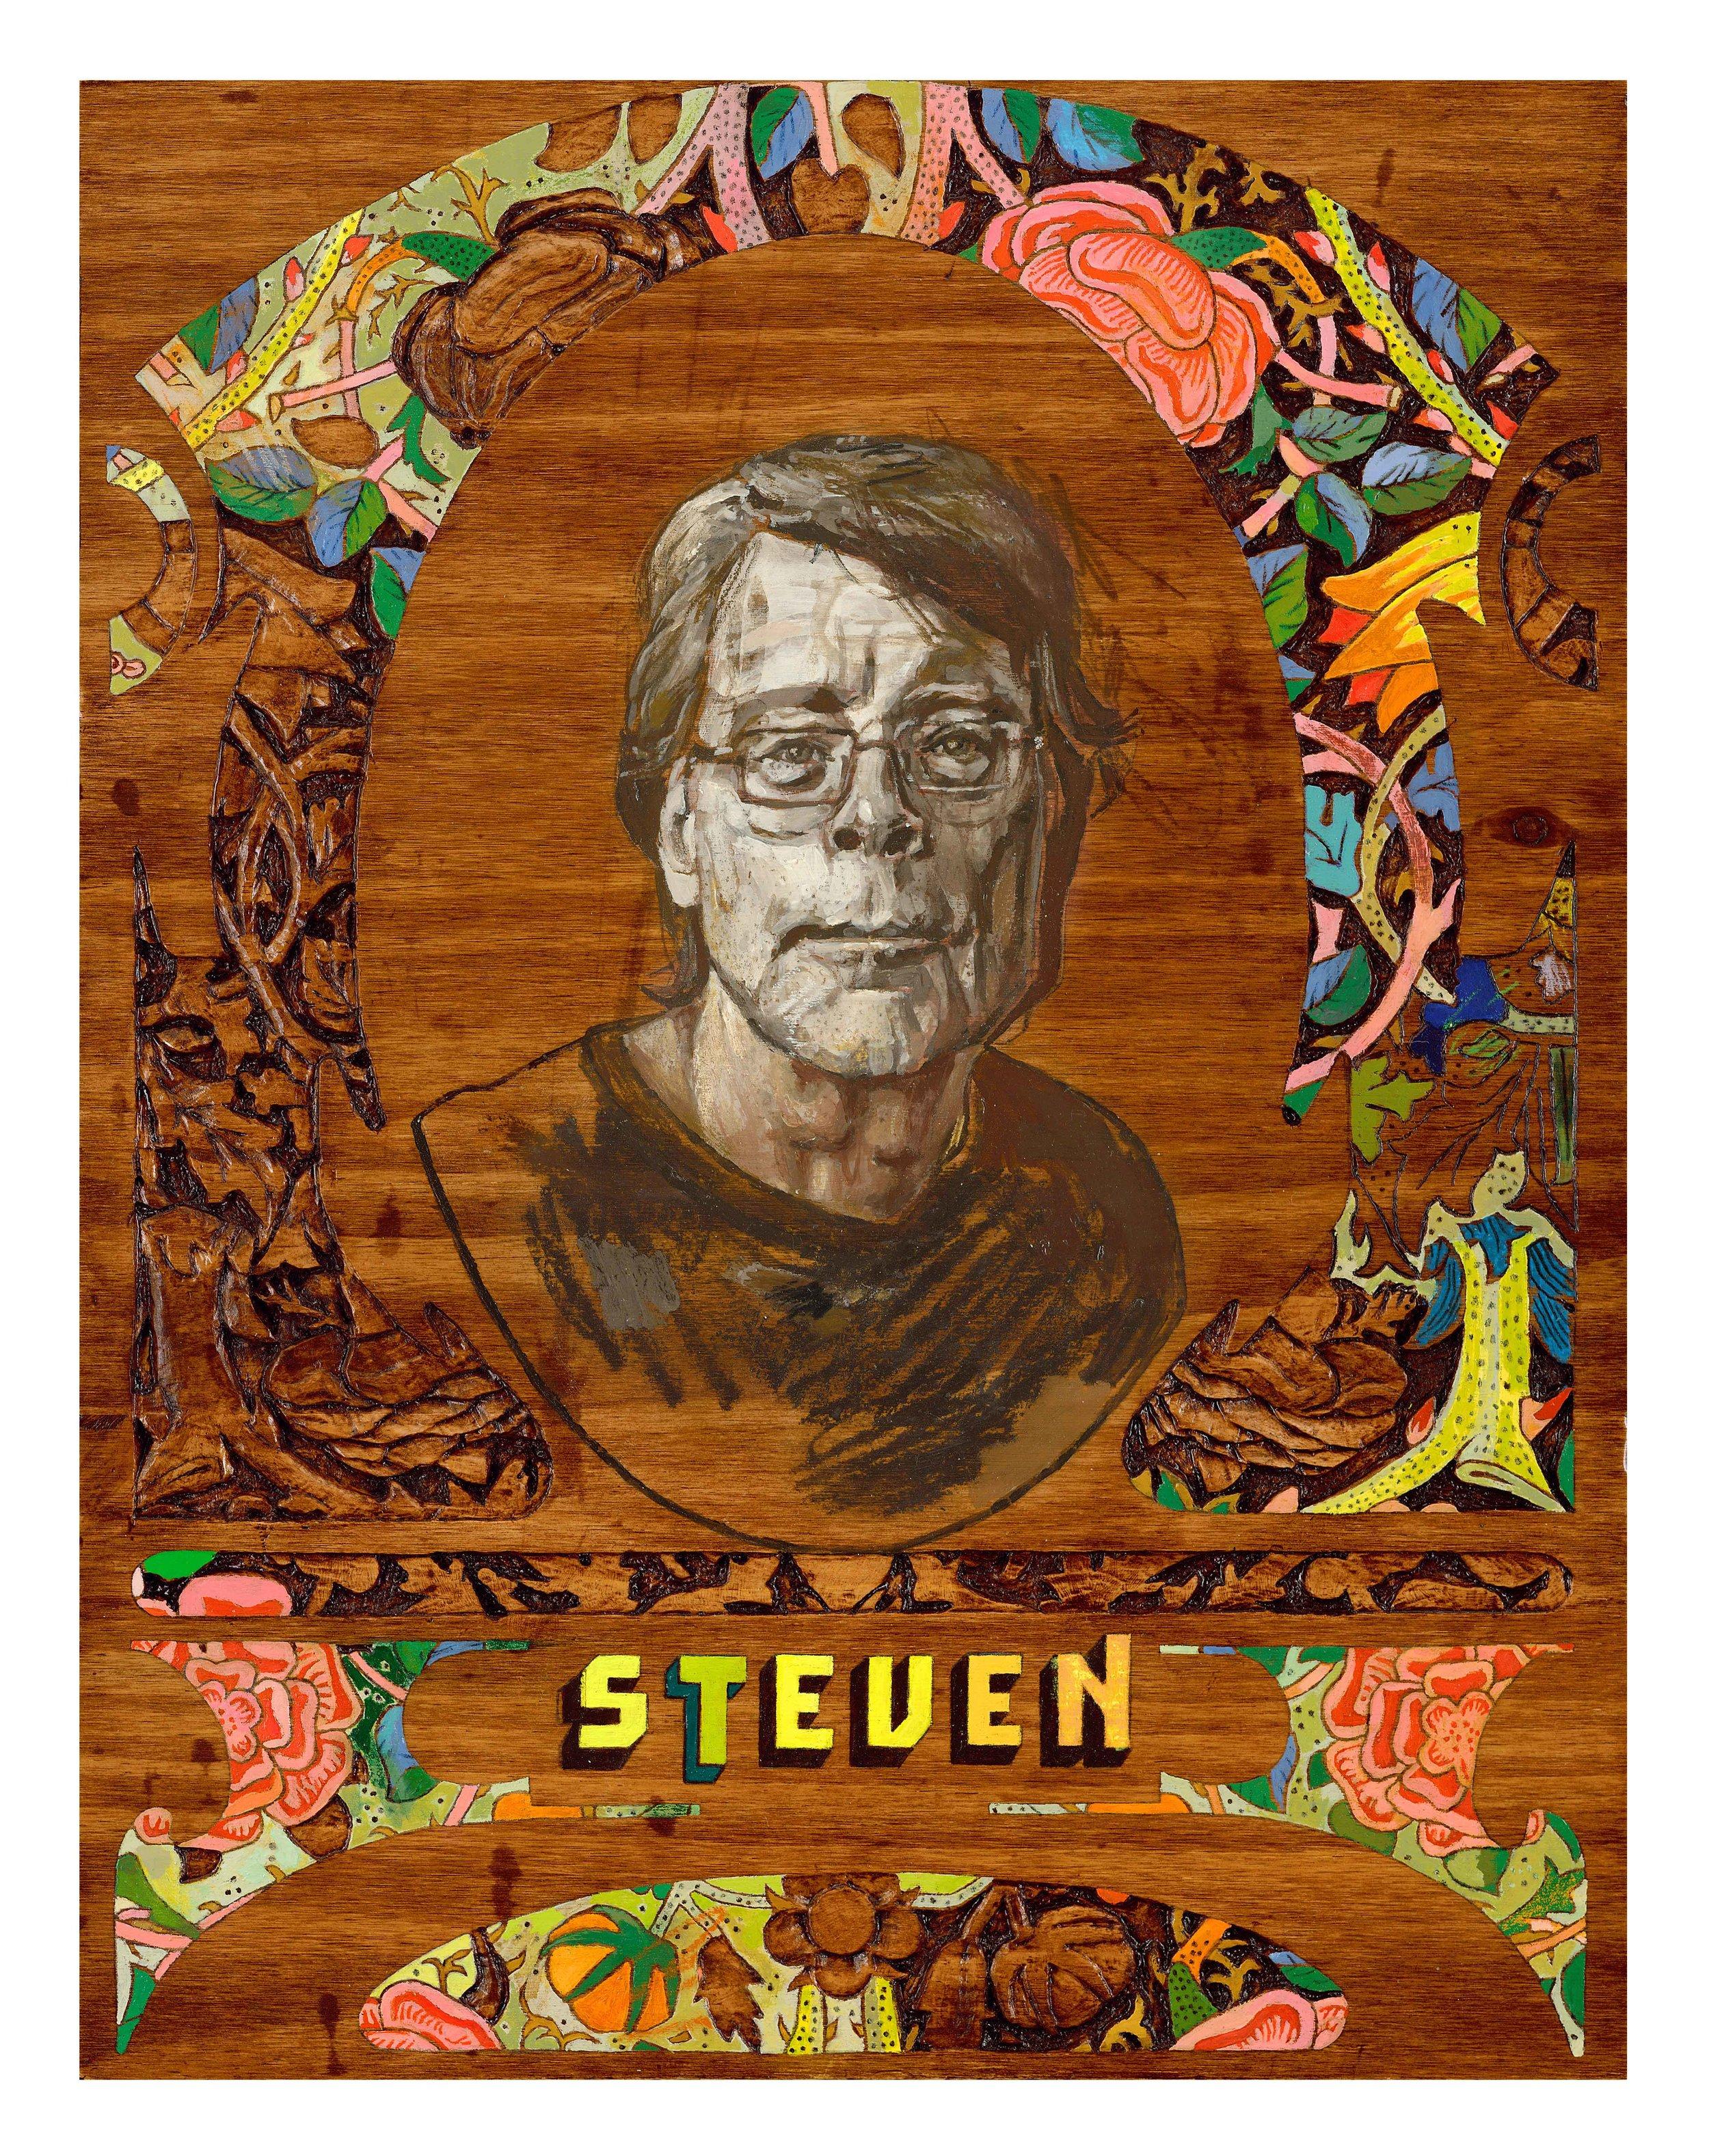 Stephen [sic] King